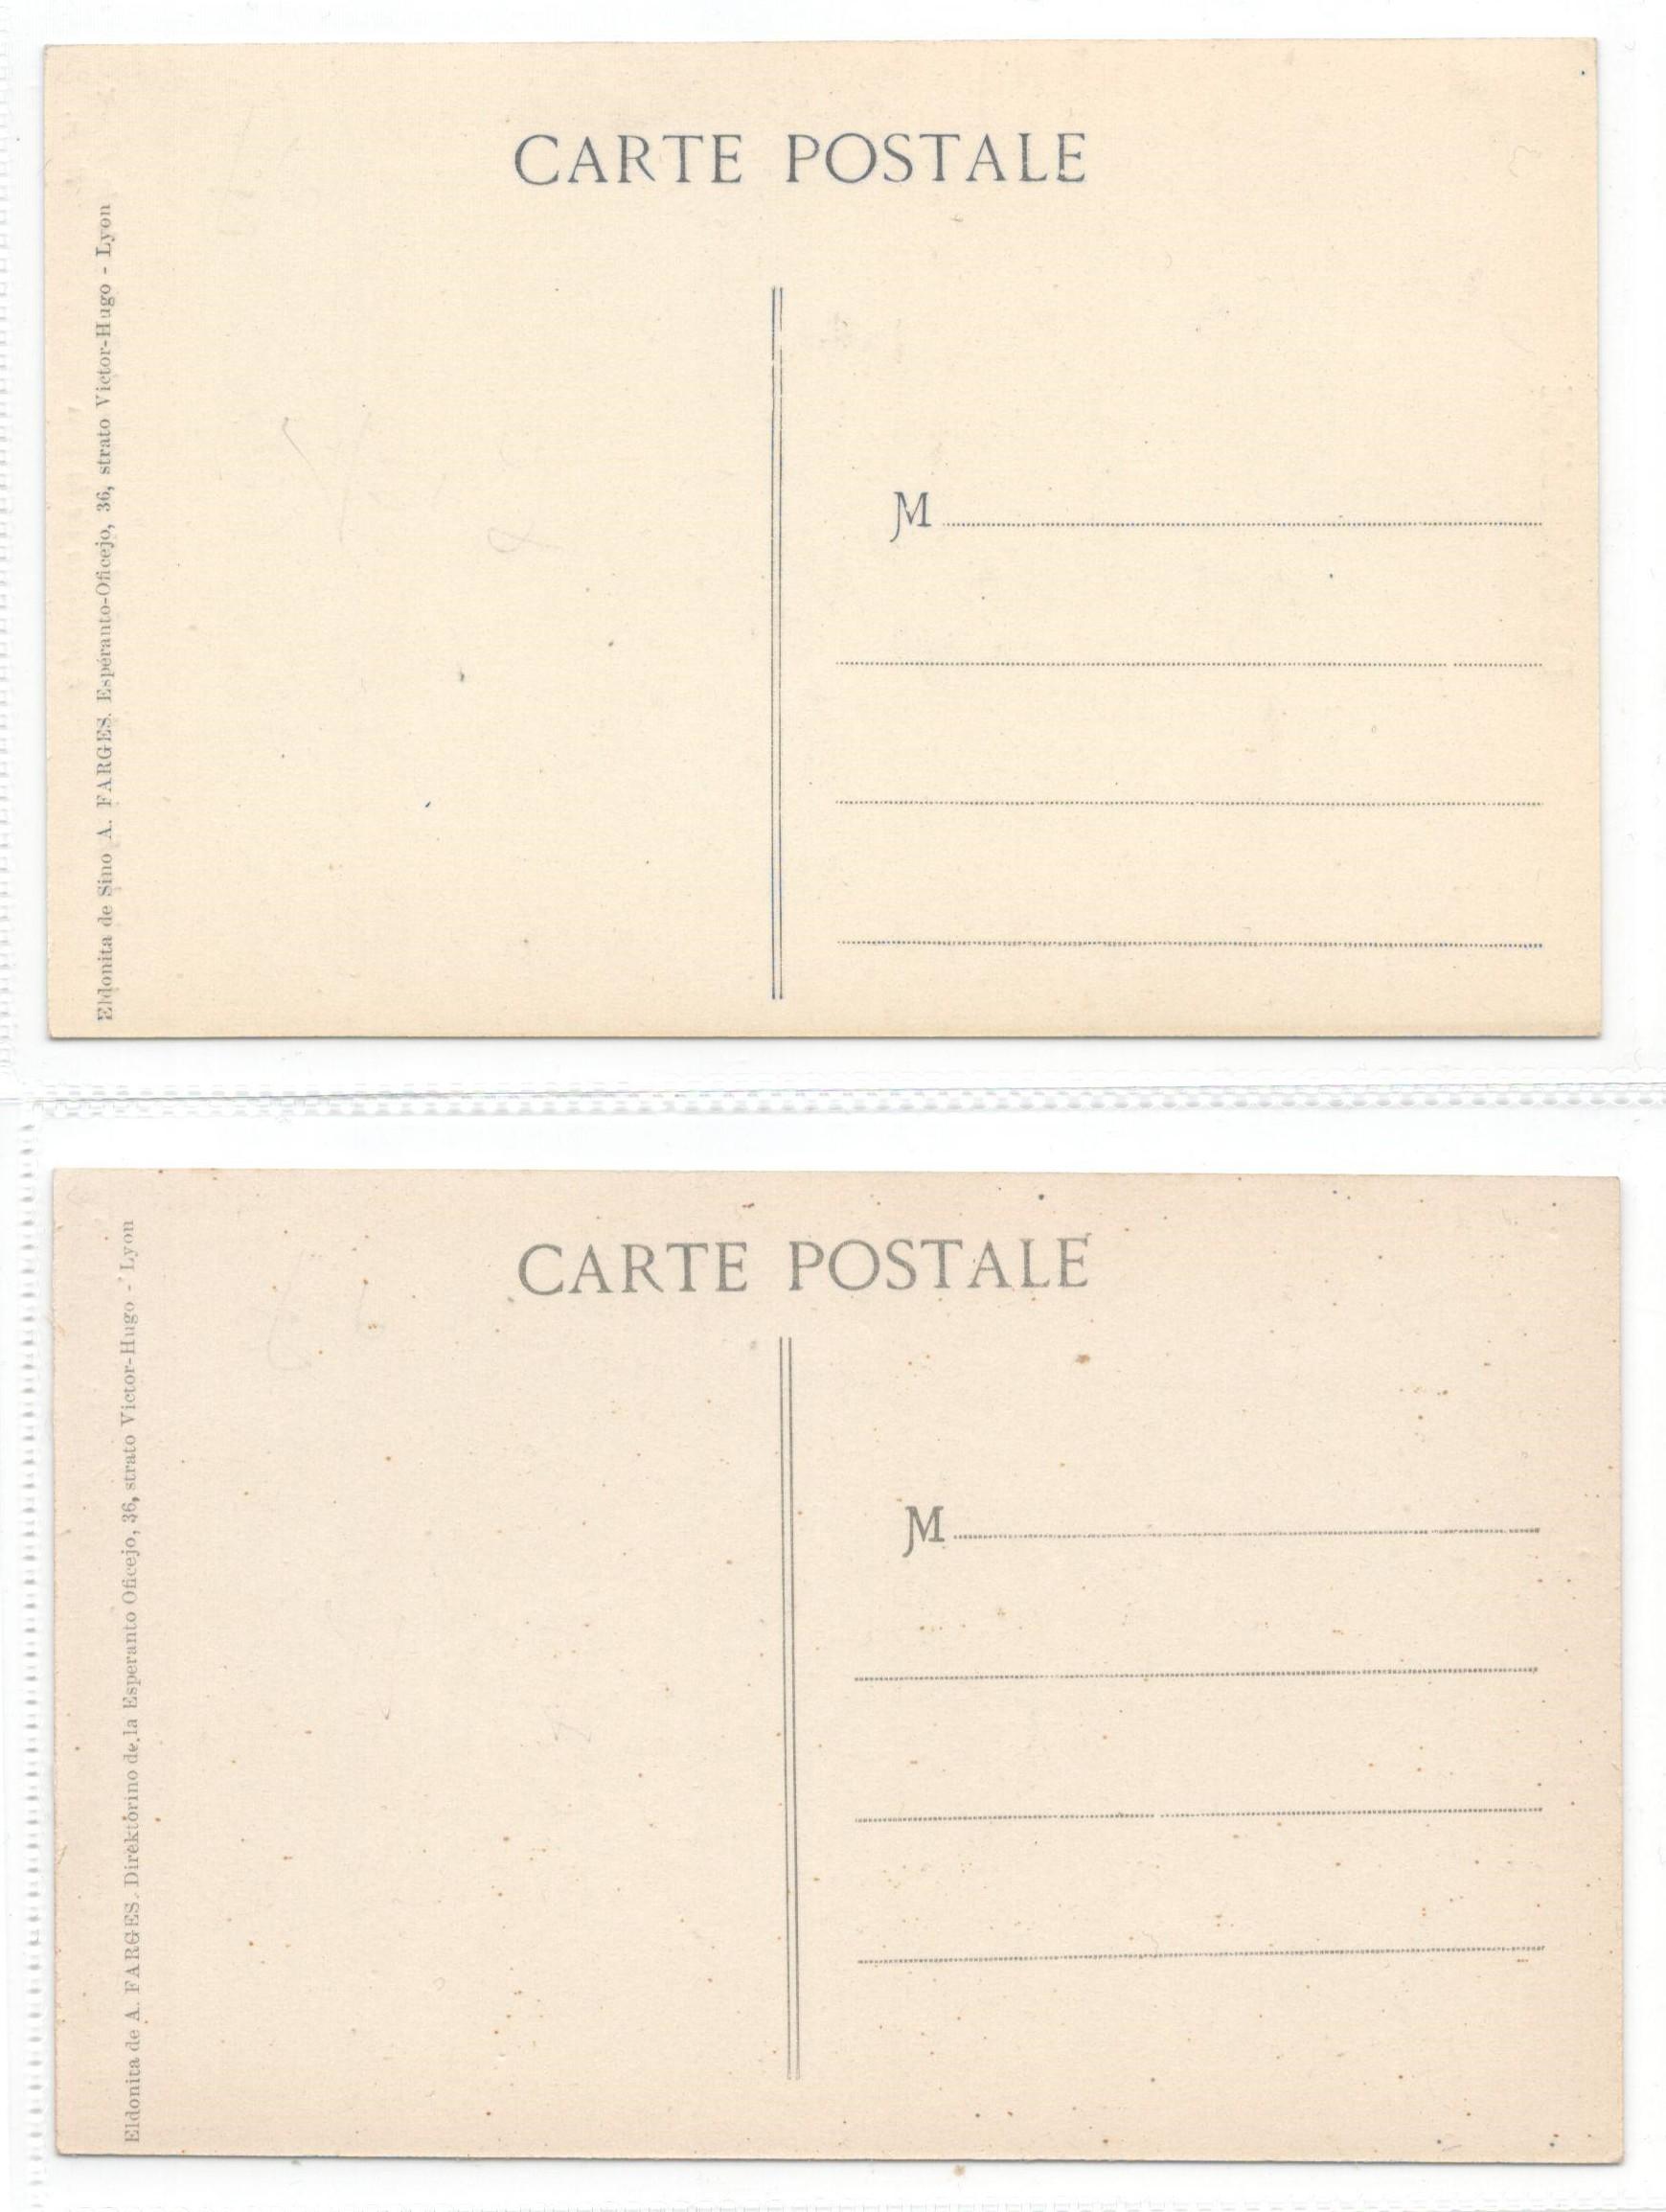 TWO ESPERANTO POSTCARDS - Image 2 of 2